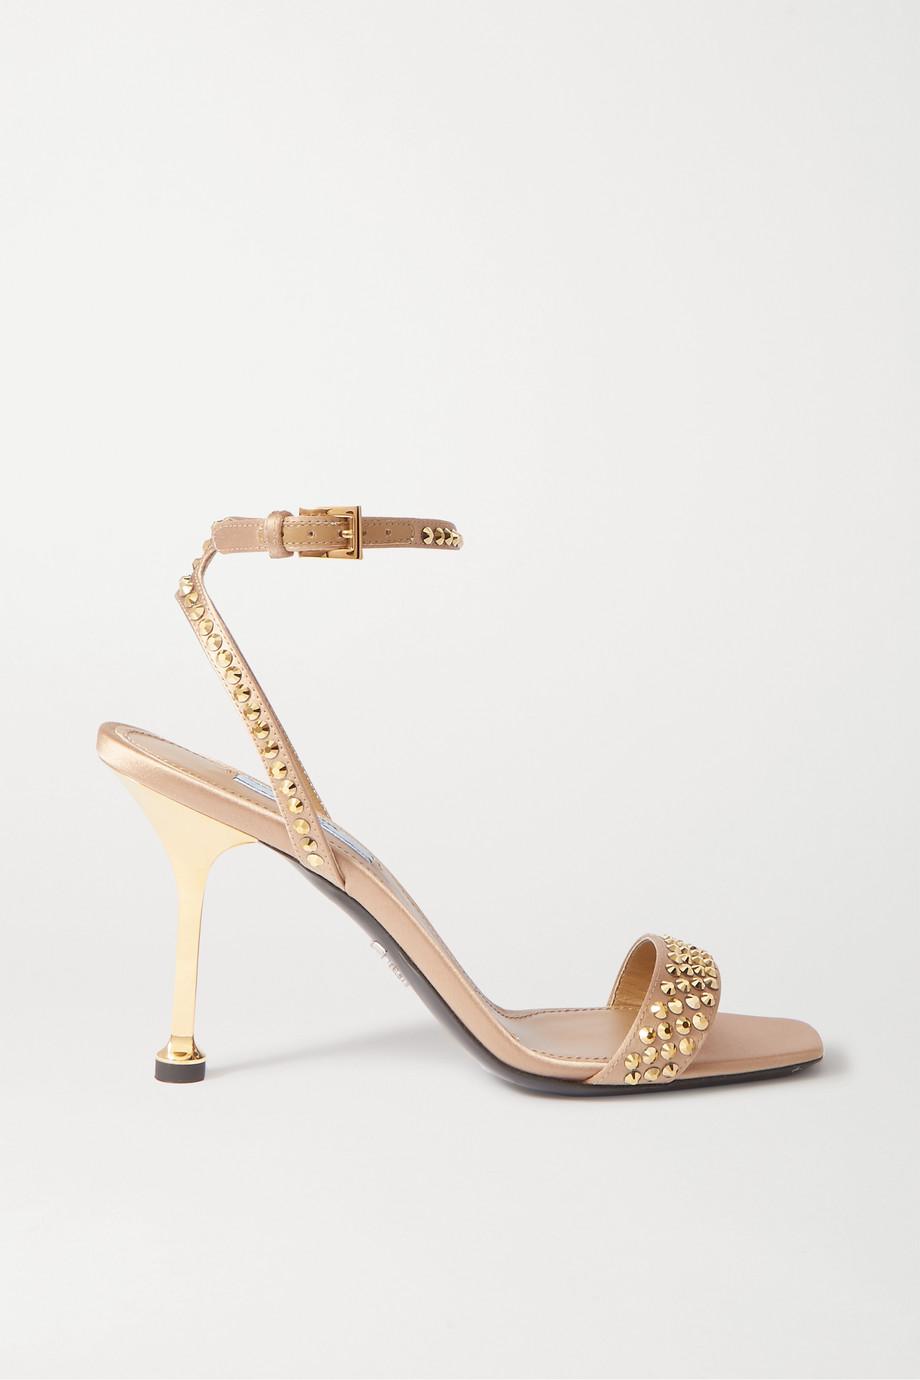 Prada Crystal-embellished satin and leather sandals